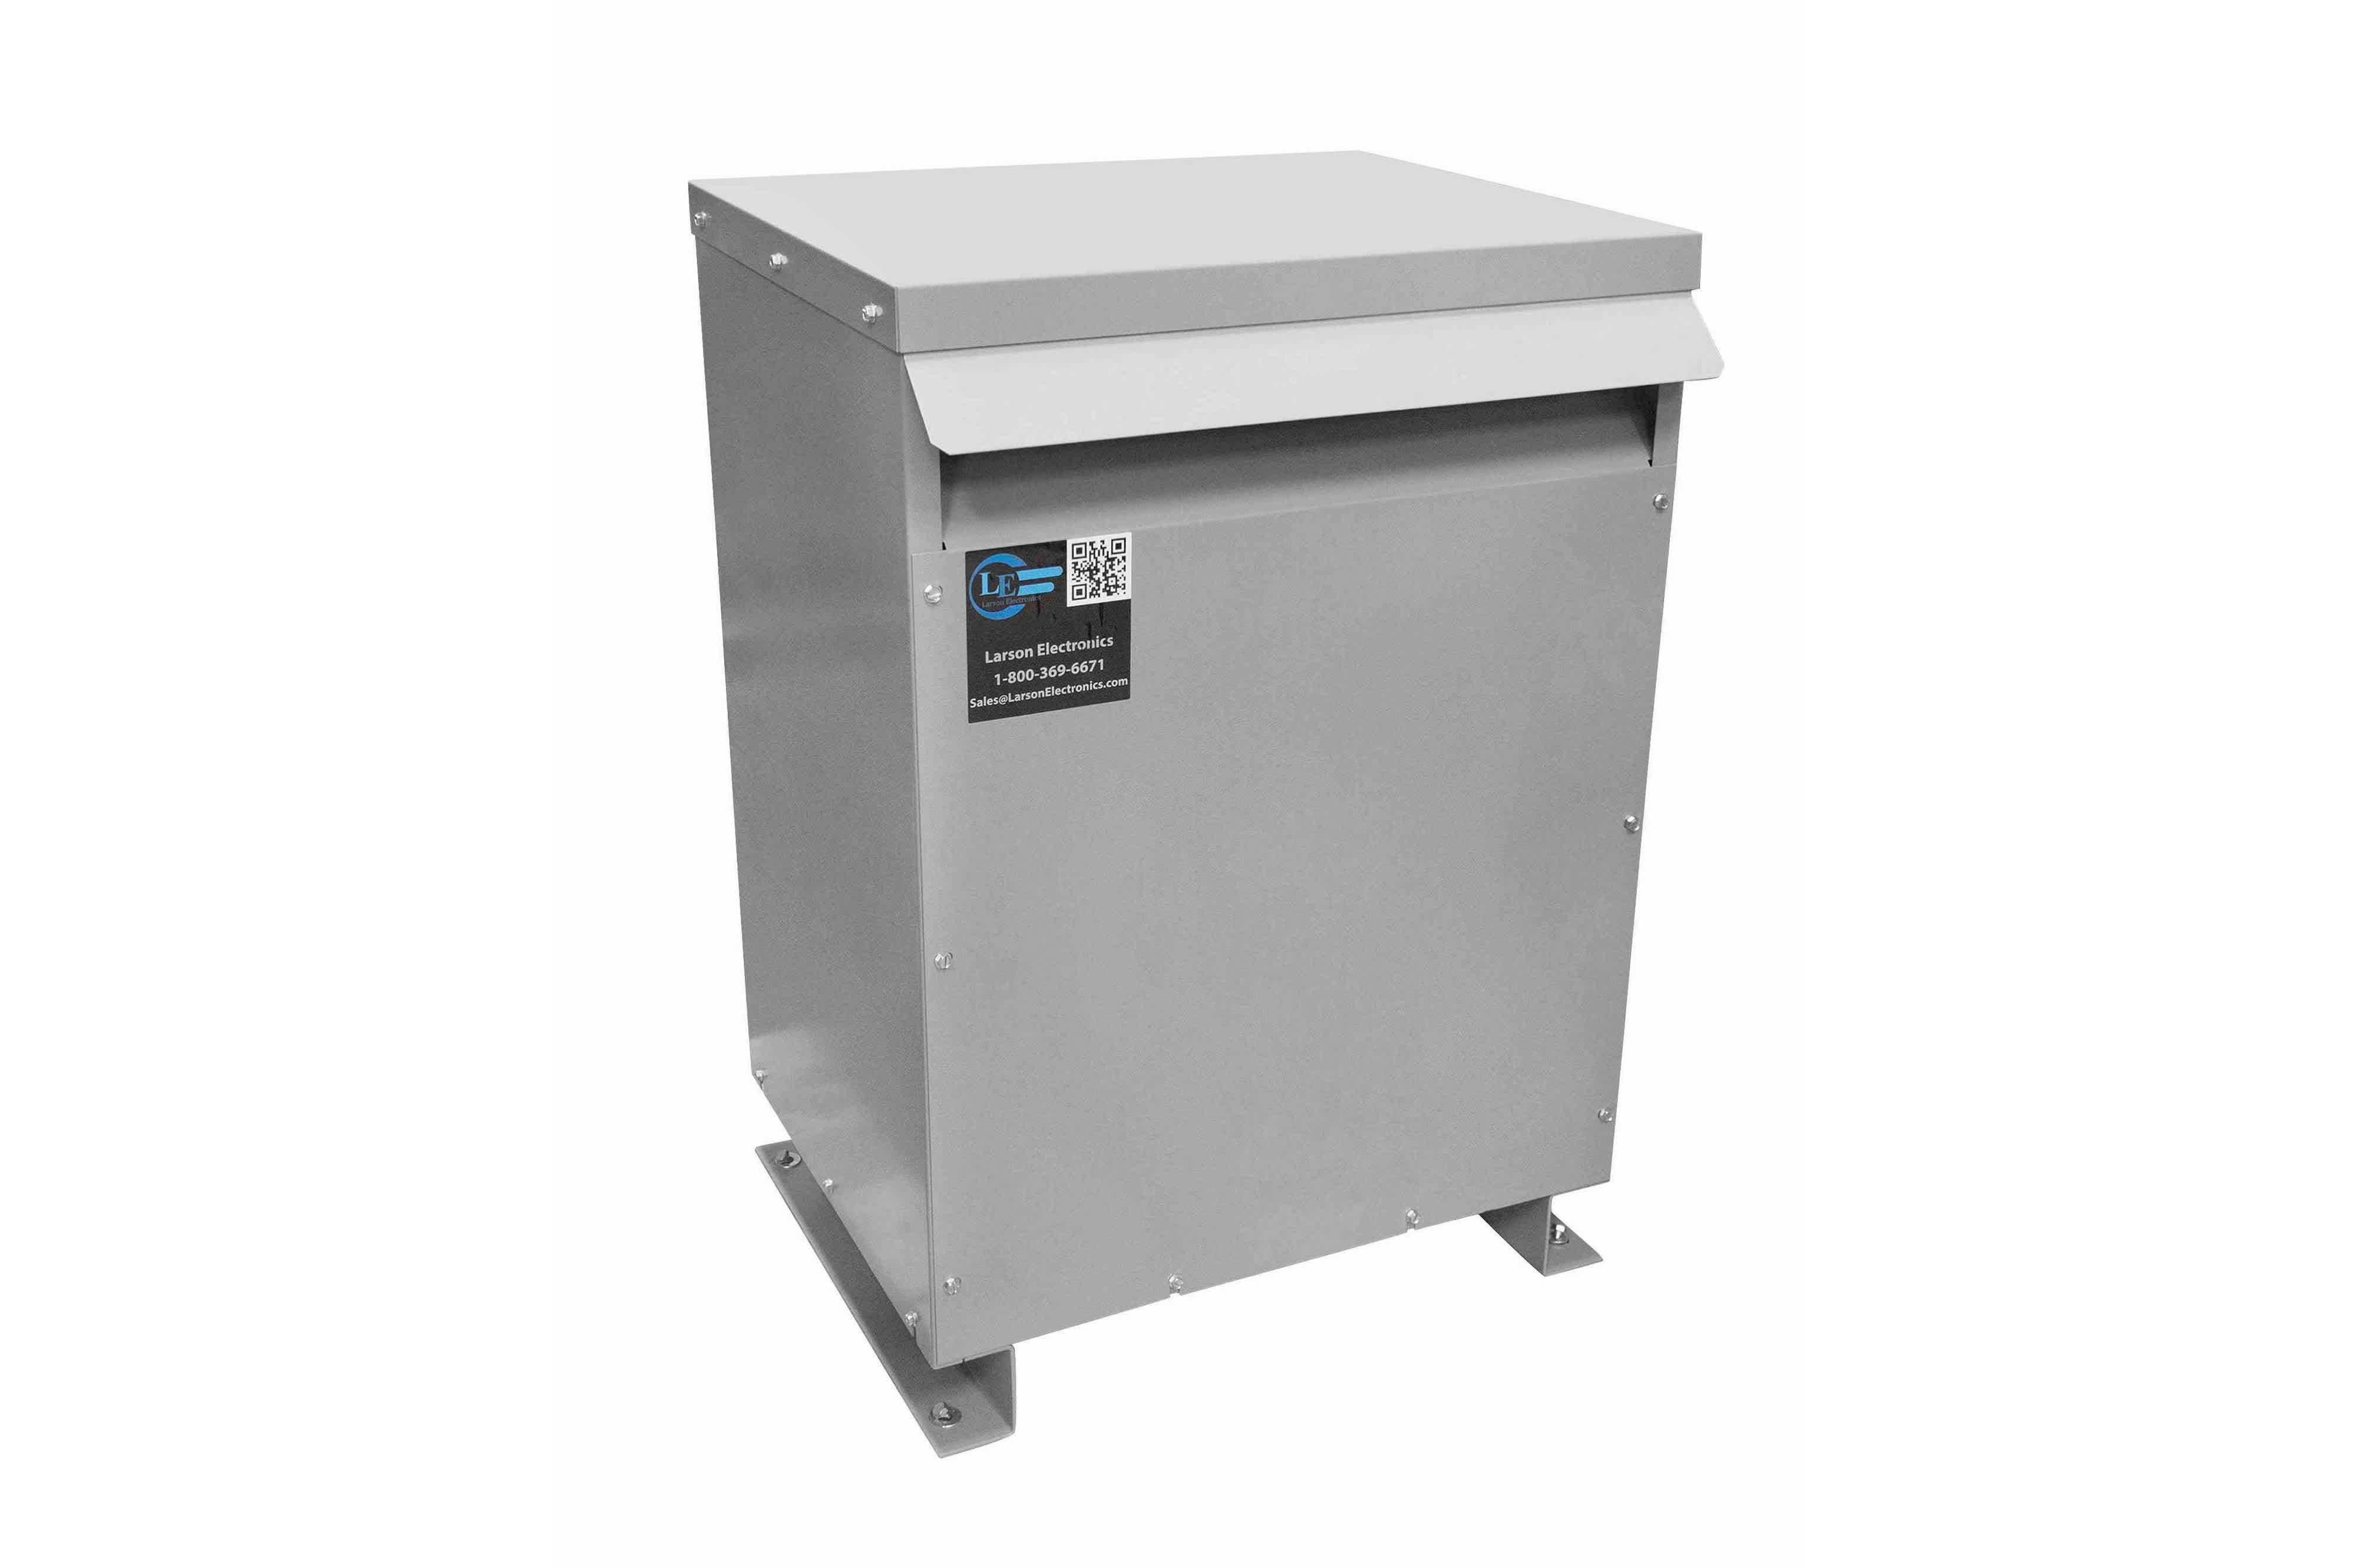 1000 kVA 3PH DOE Transformer, 240V Delta Primary, 400Y/231 Wye-N Secondary, N3R, Ventilated, 60 Hz